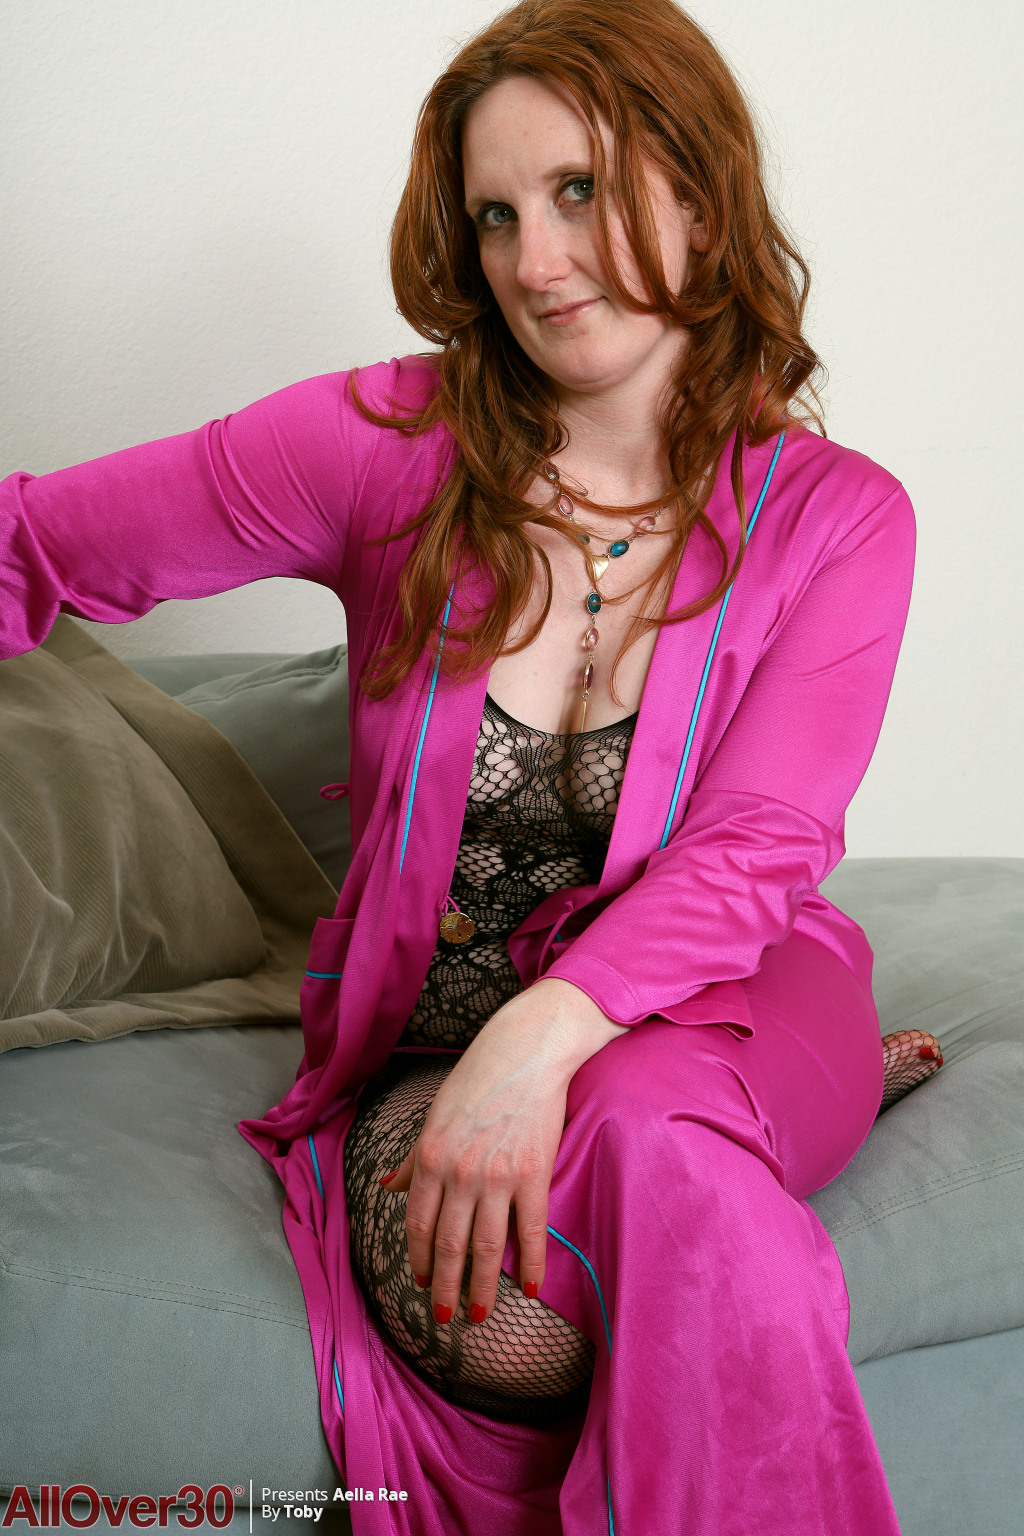 Aella Rae from AllOver30